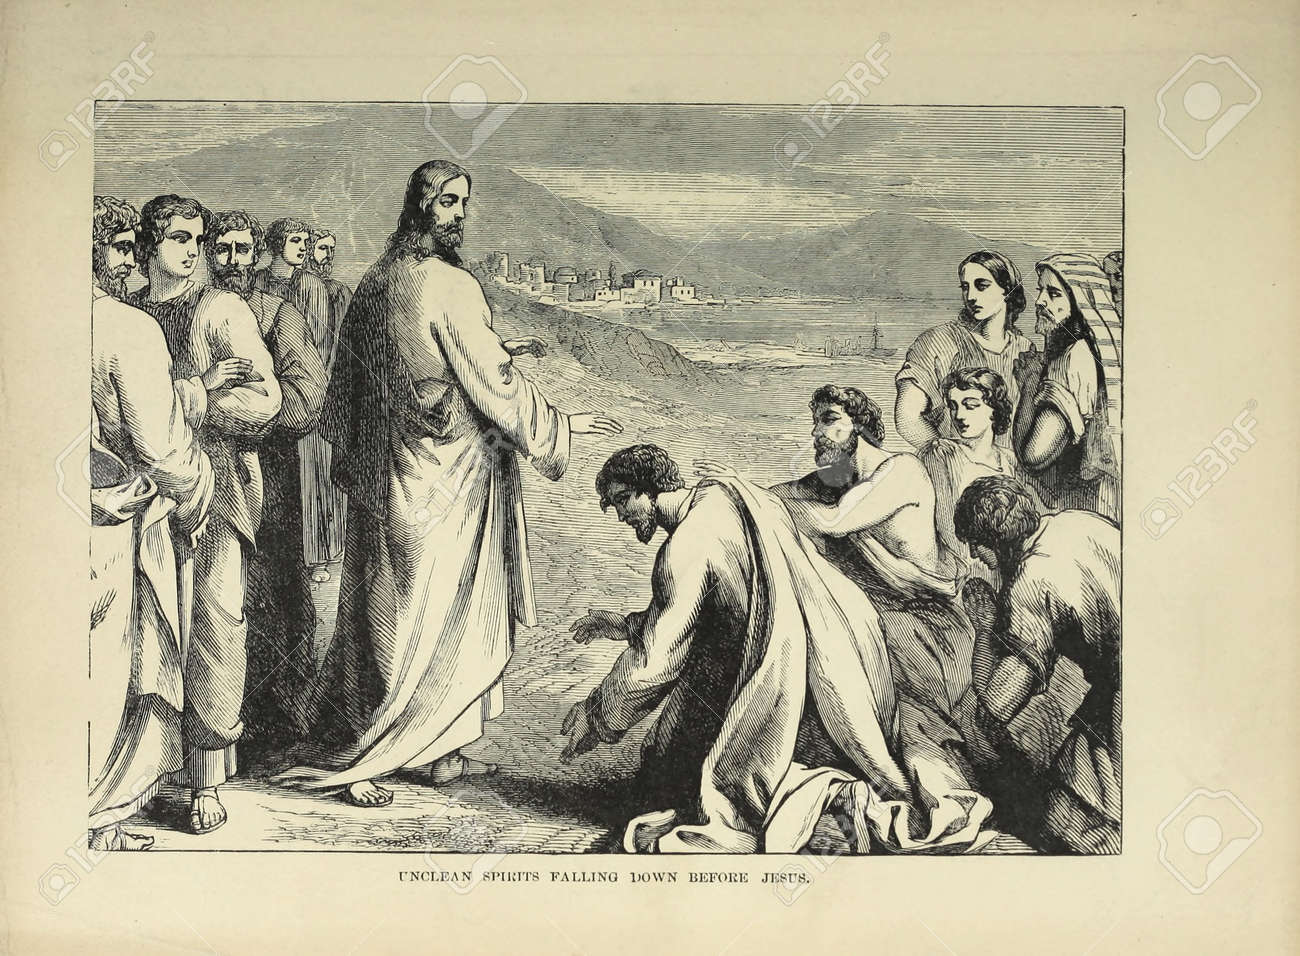 Christian illustration. Retro and old image - 125966117